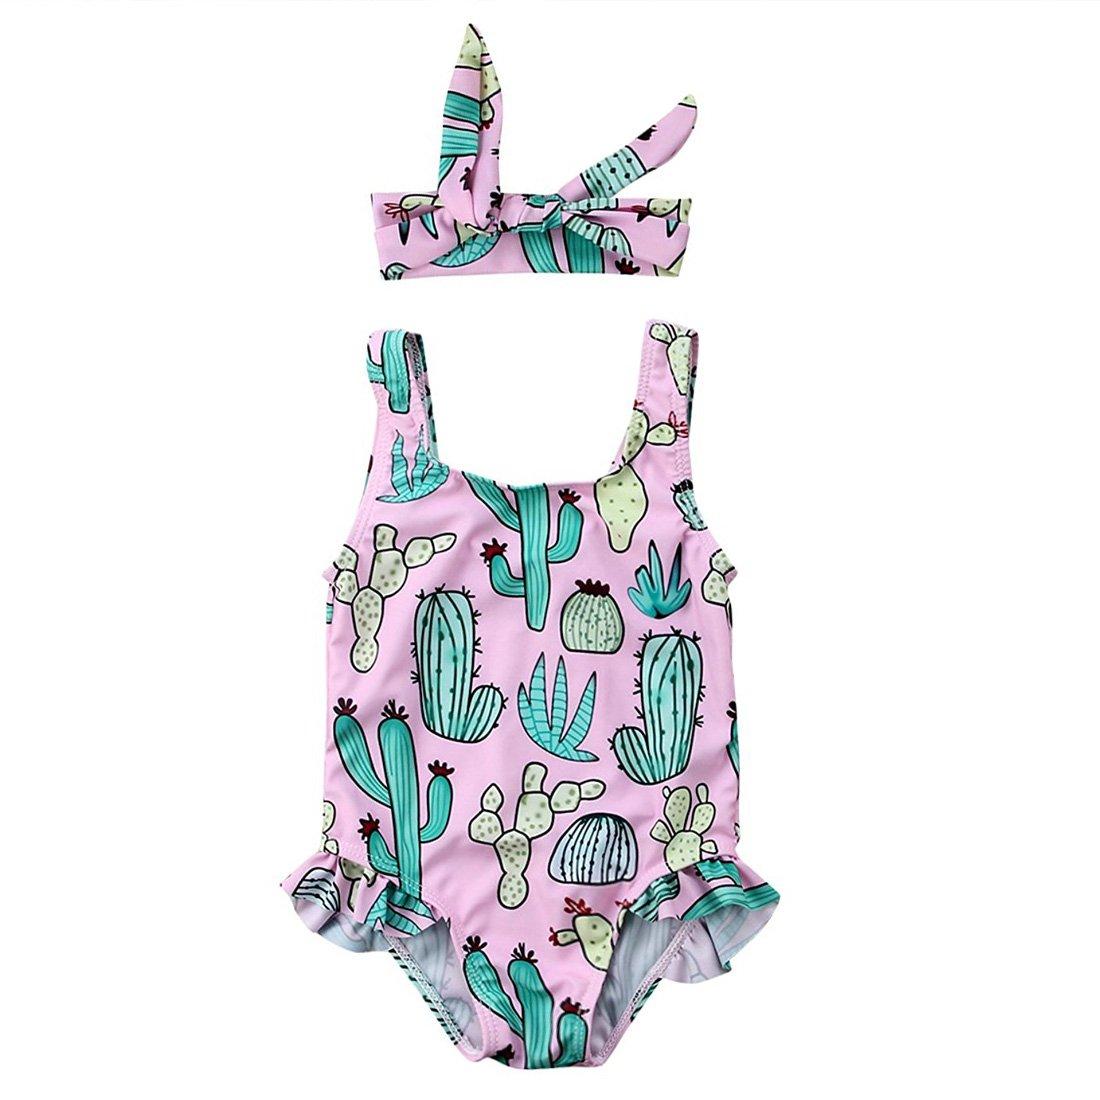 Cenhope Infant Baby Girls One-Piece Swimsuit Toddler Girl Cactus Sleeveless Ruffles Swimwear Beachwear with Headband